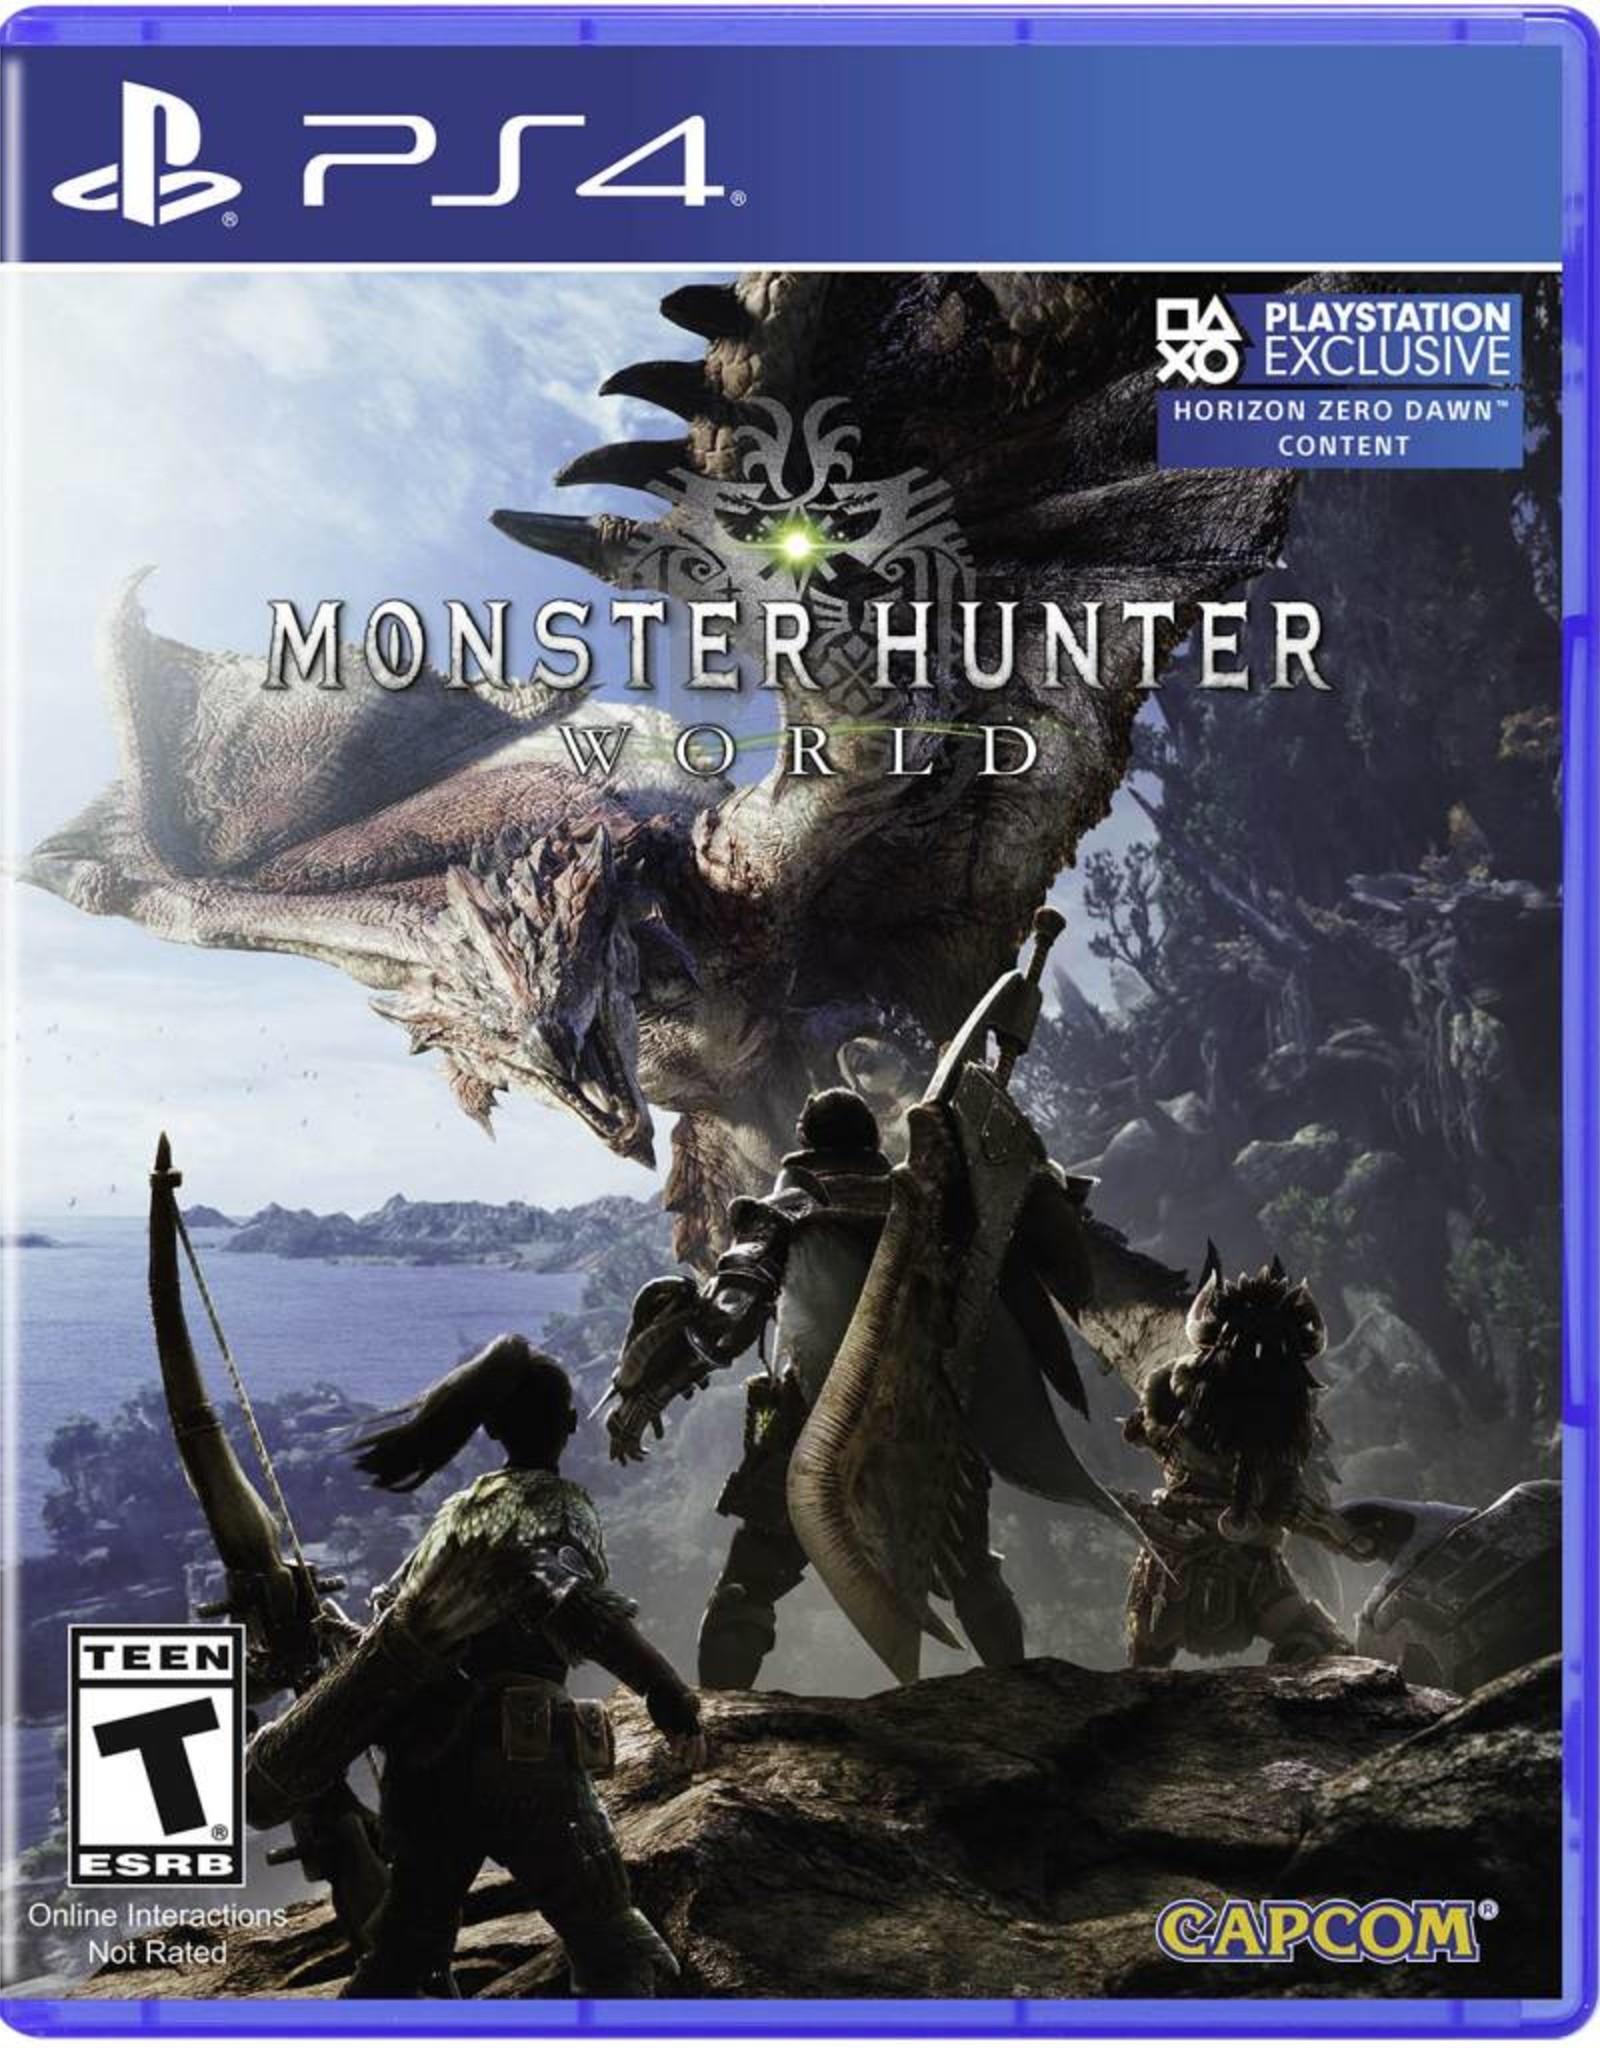 MONSTER HUNTER: WORLD- PS4 DIGITAL